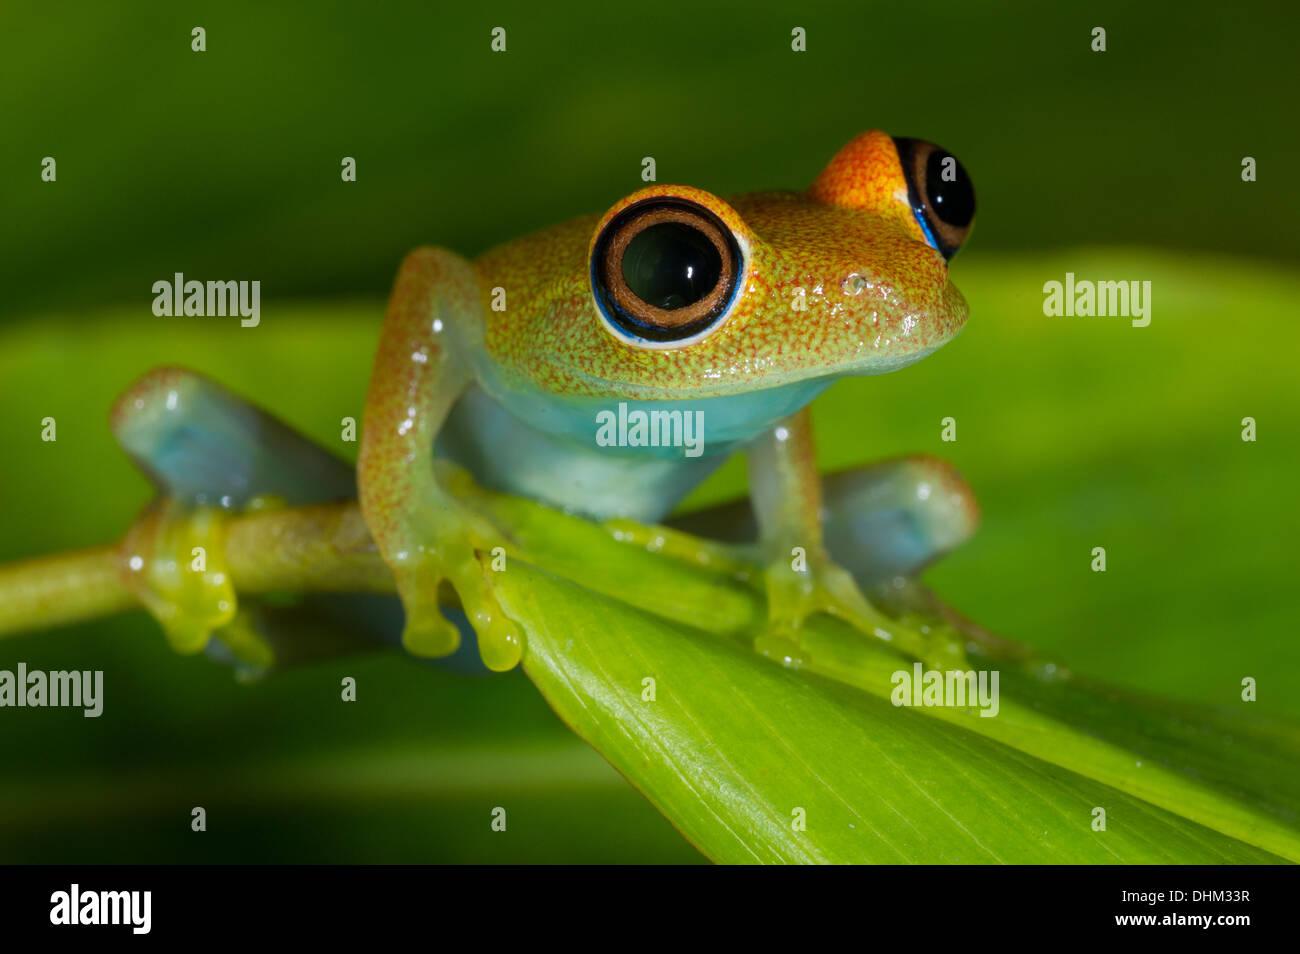 Frog, Boophis viridis, Analamazaotra Special Reserve, Andasibe Mantadia National Park, Madagascar Stock Photo